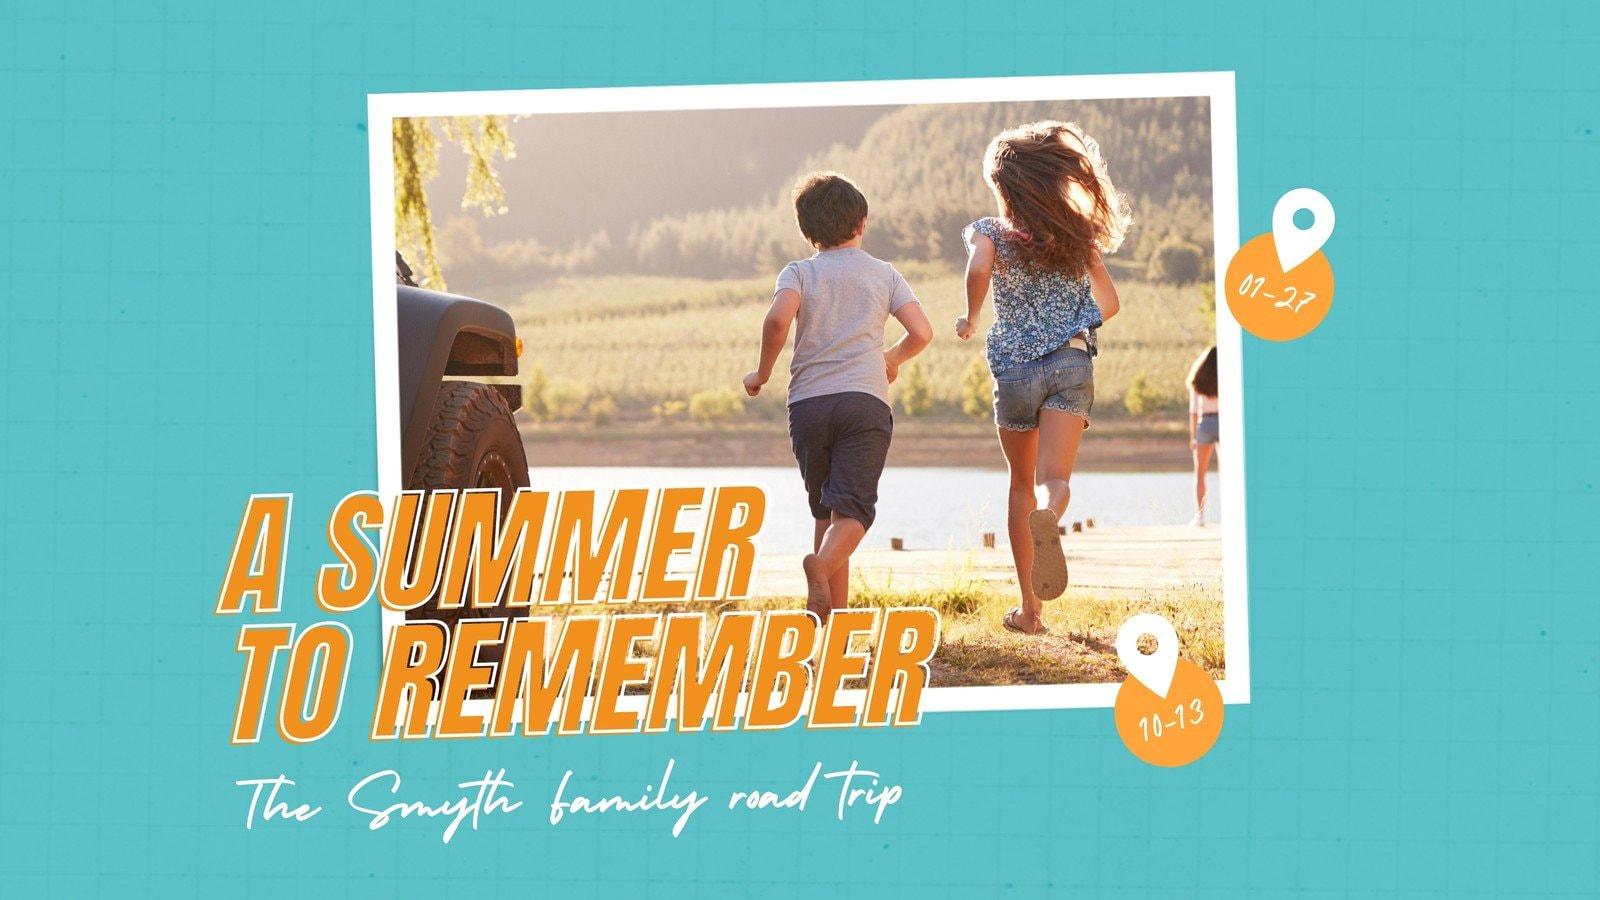 Orange and Teal Adventure Time Family Travel Memories Slideshow